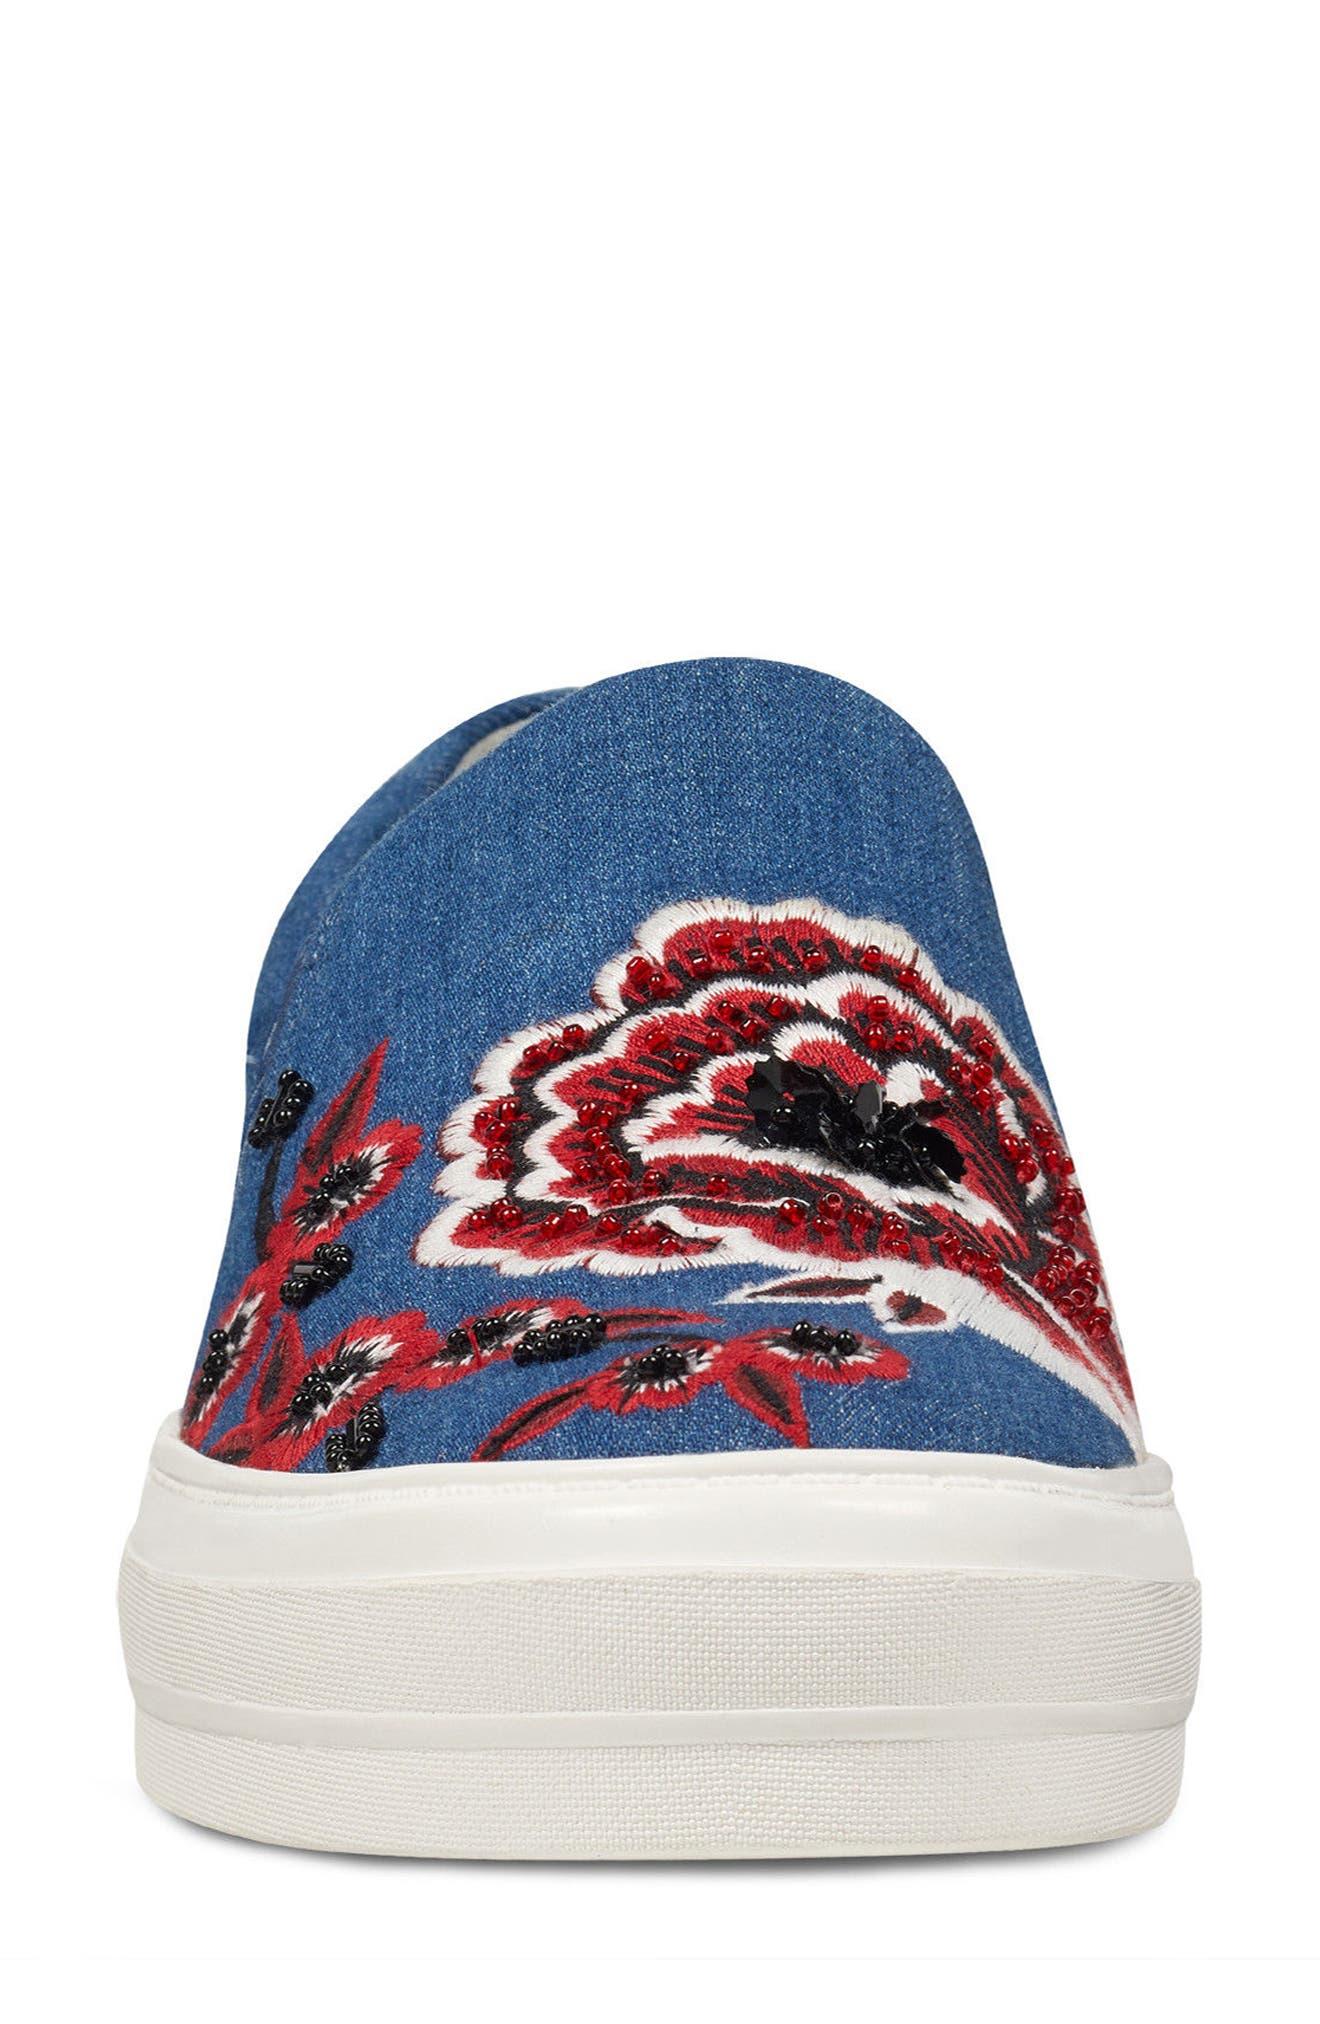 Alternate Image 4  - Nine West Onyeka Embroidered Slip-On Sneaker (Women)